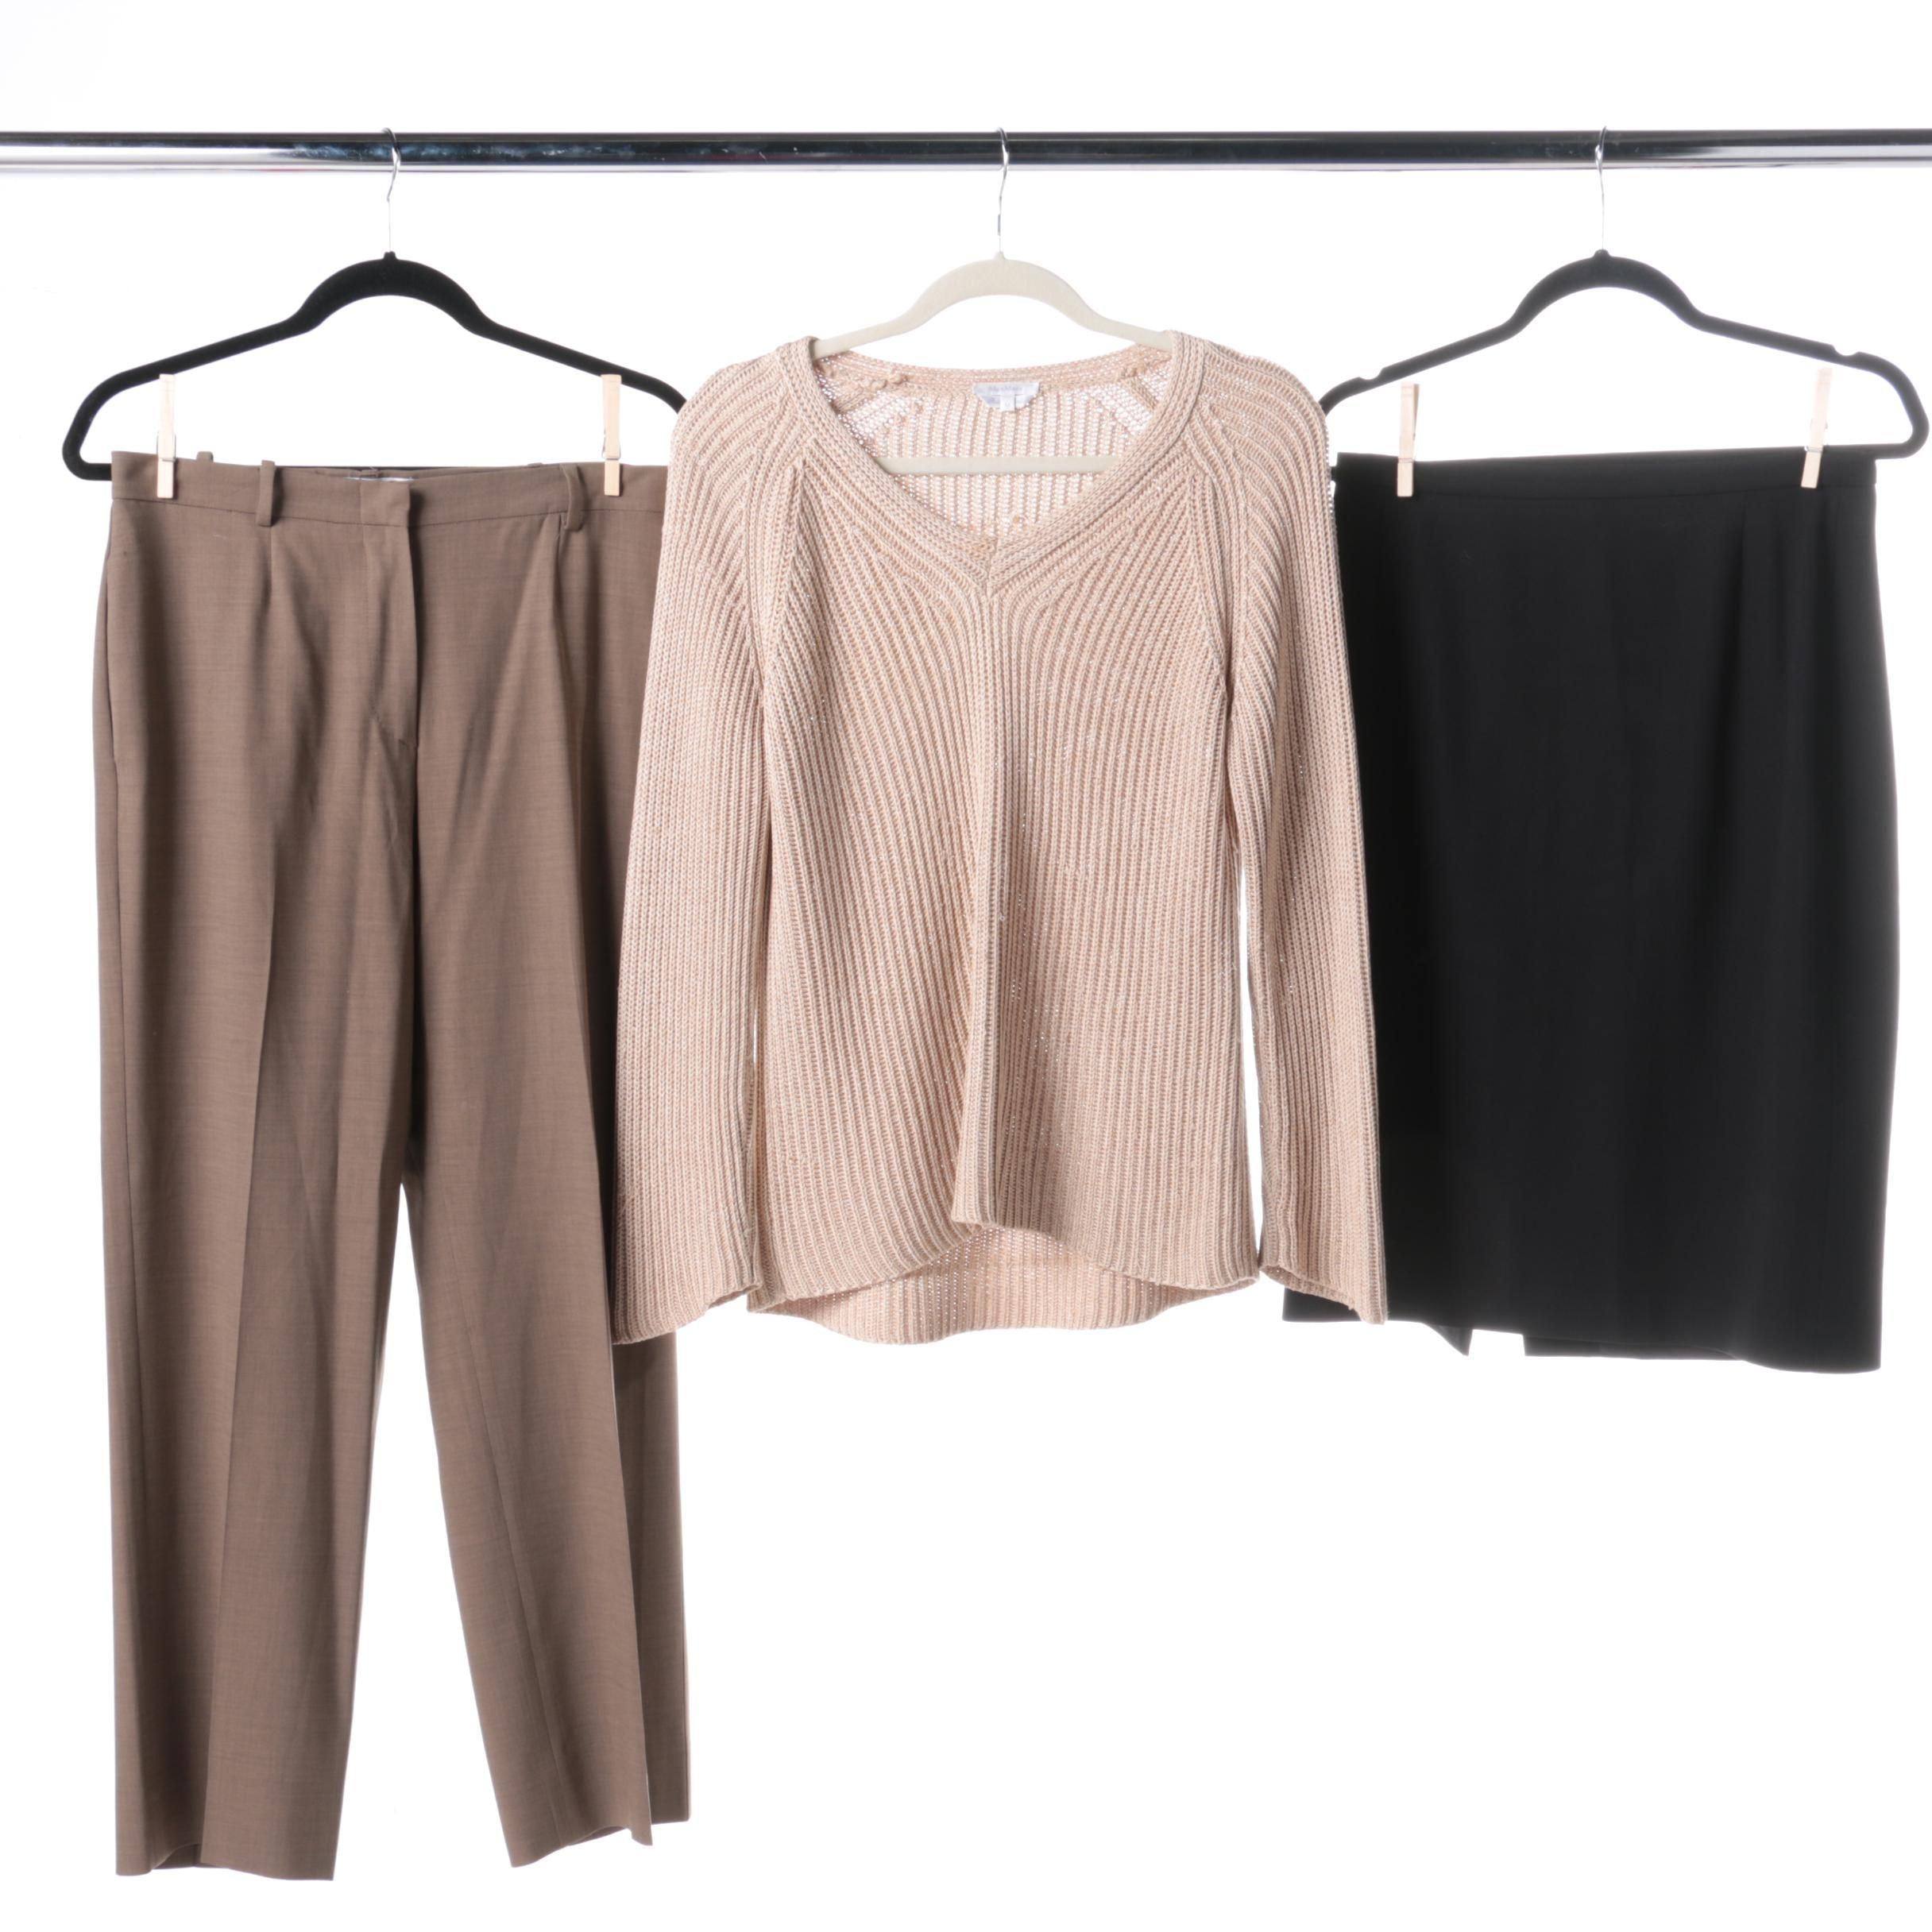 MaxMara Sweater, Pair of Pants, and a Skirt